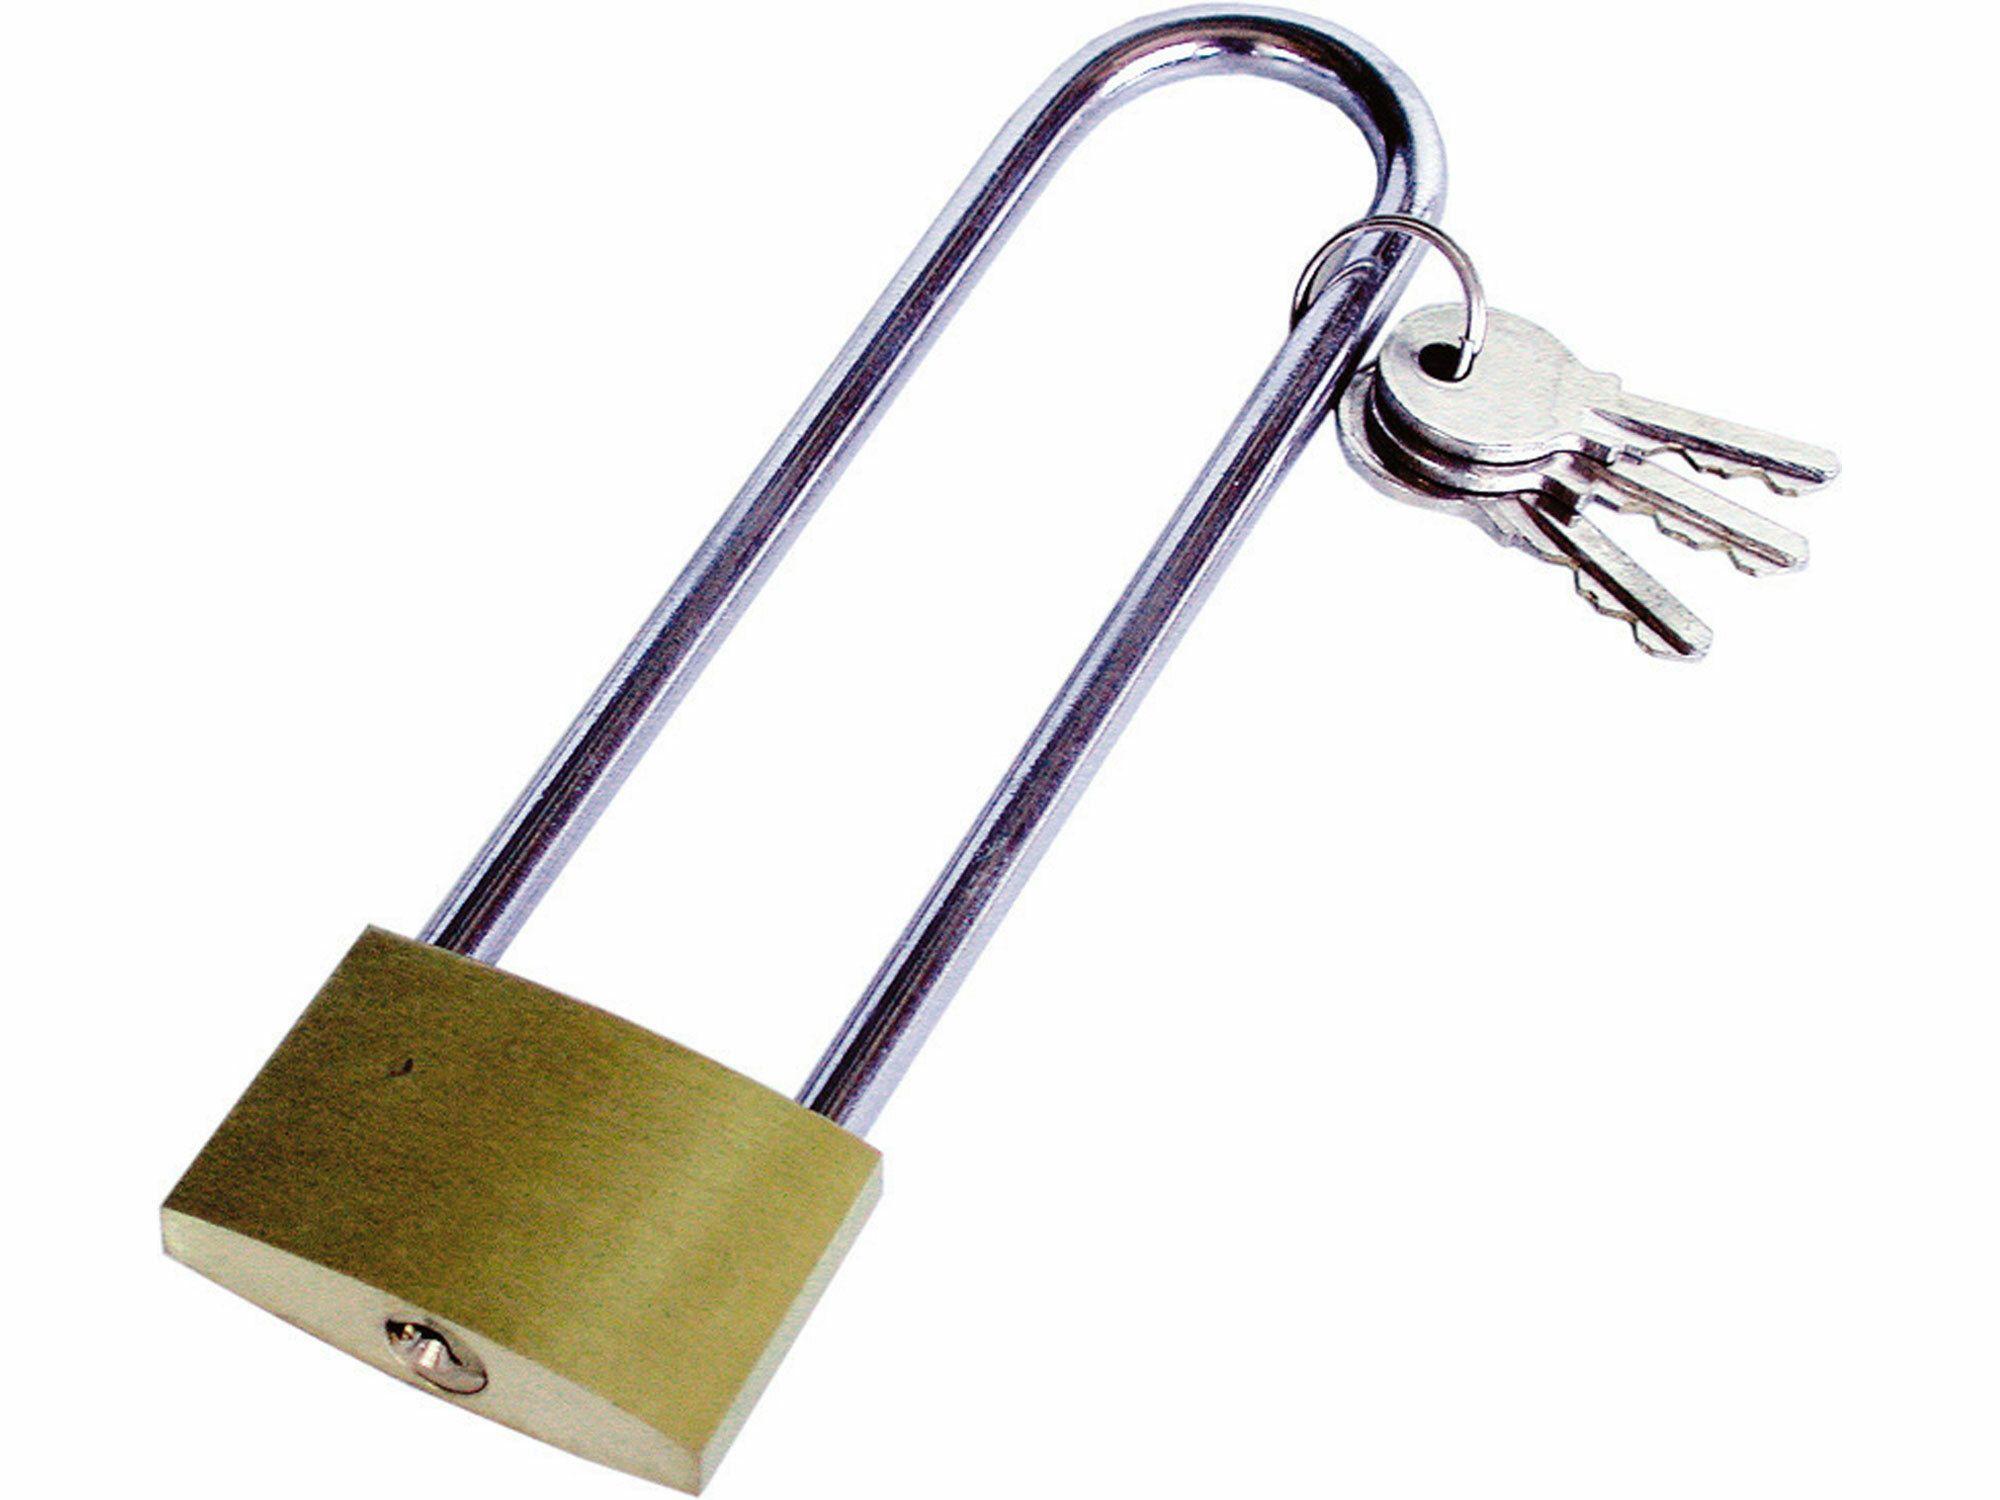 Zámek mosazný na kolo, 40x105mm, 3 klíče, EXTOL CRAFT